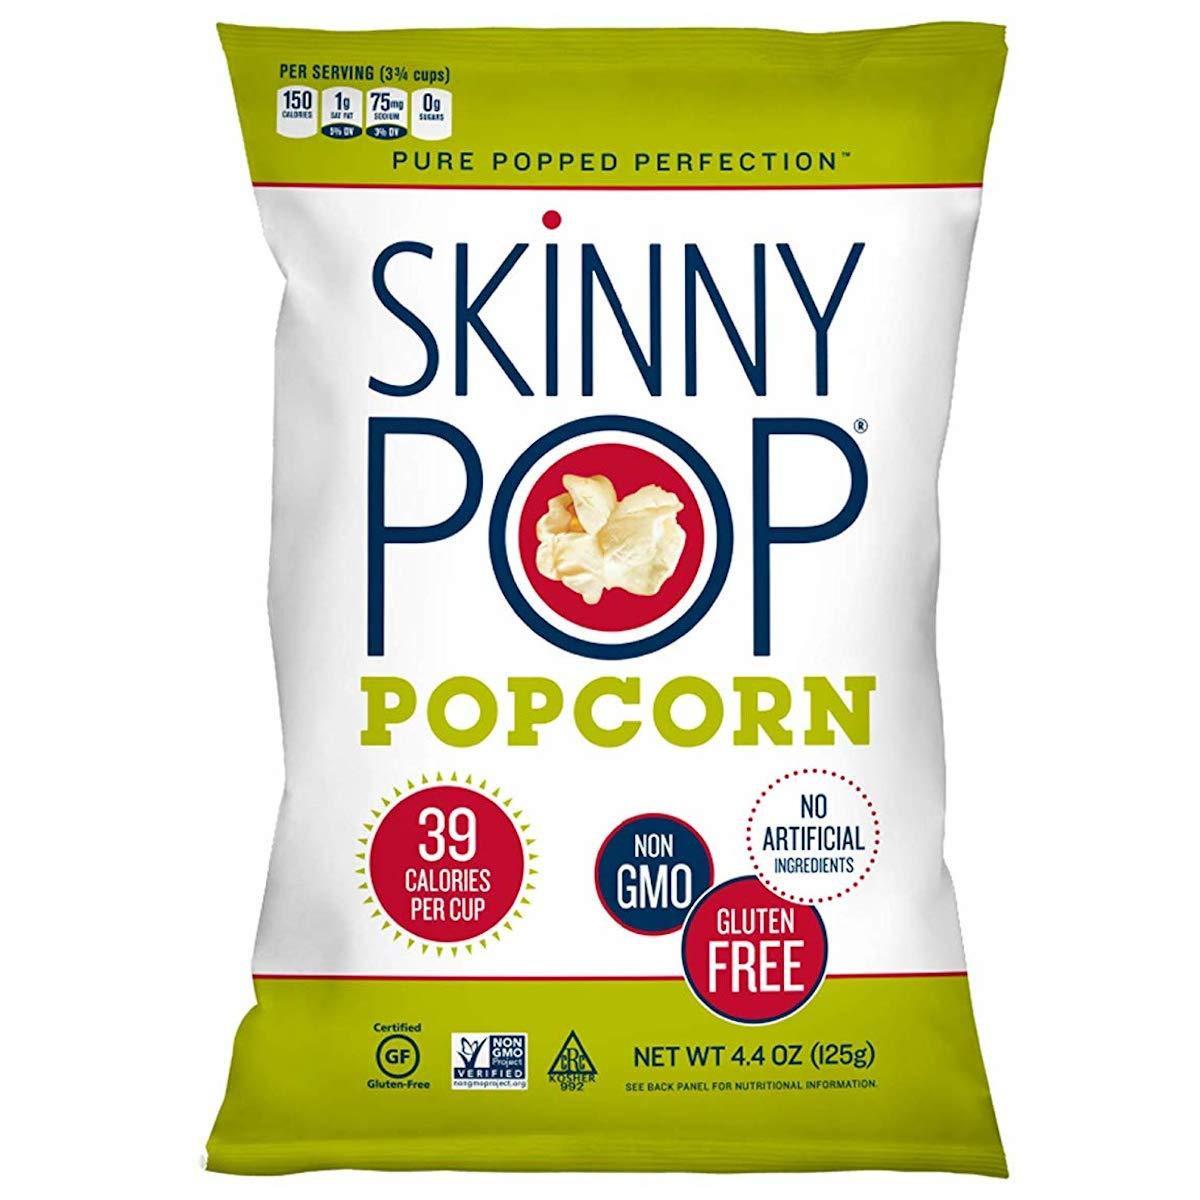 SkinnyPop Orignal Popcorn, 4.4oz Grocery Size Bags, Skinny Pop, Healthy Popcorn Snacks, Gluten Free